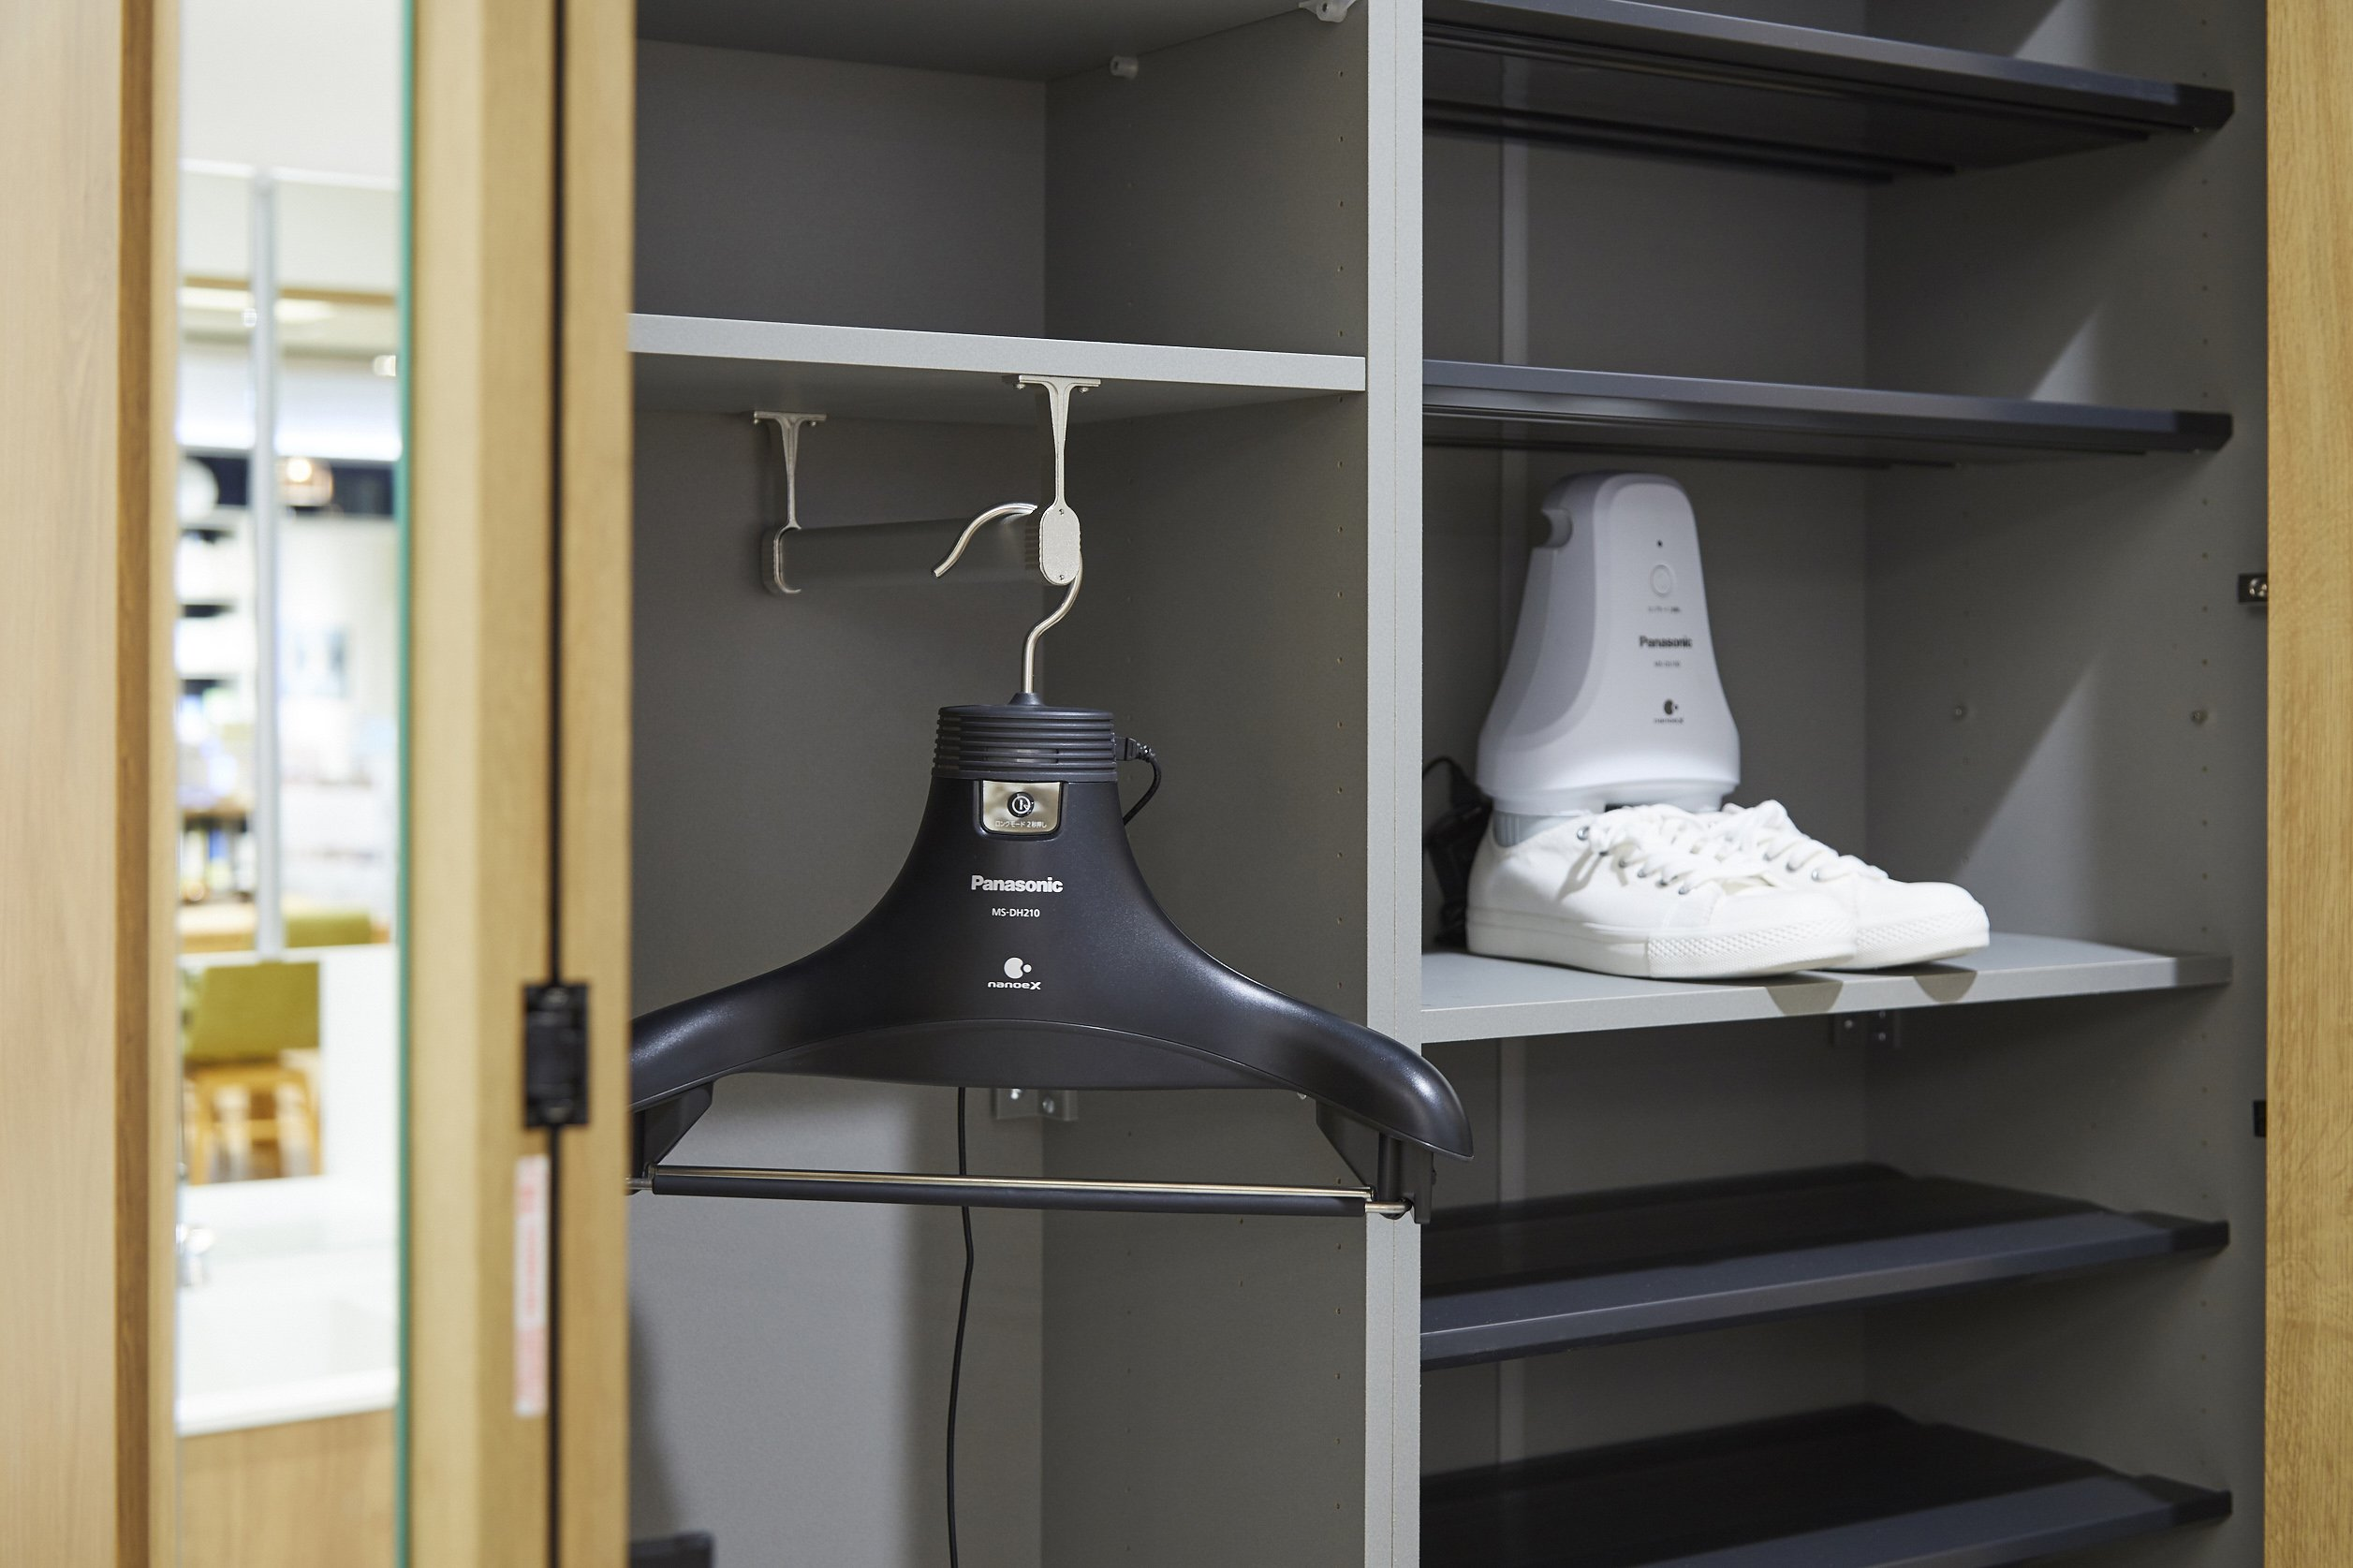 Photo: nanoe(TM) equipped deodorizing hanger and shoe deodorizer